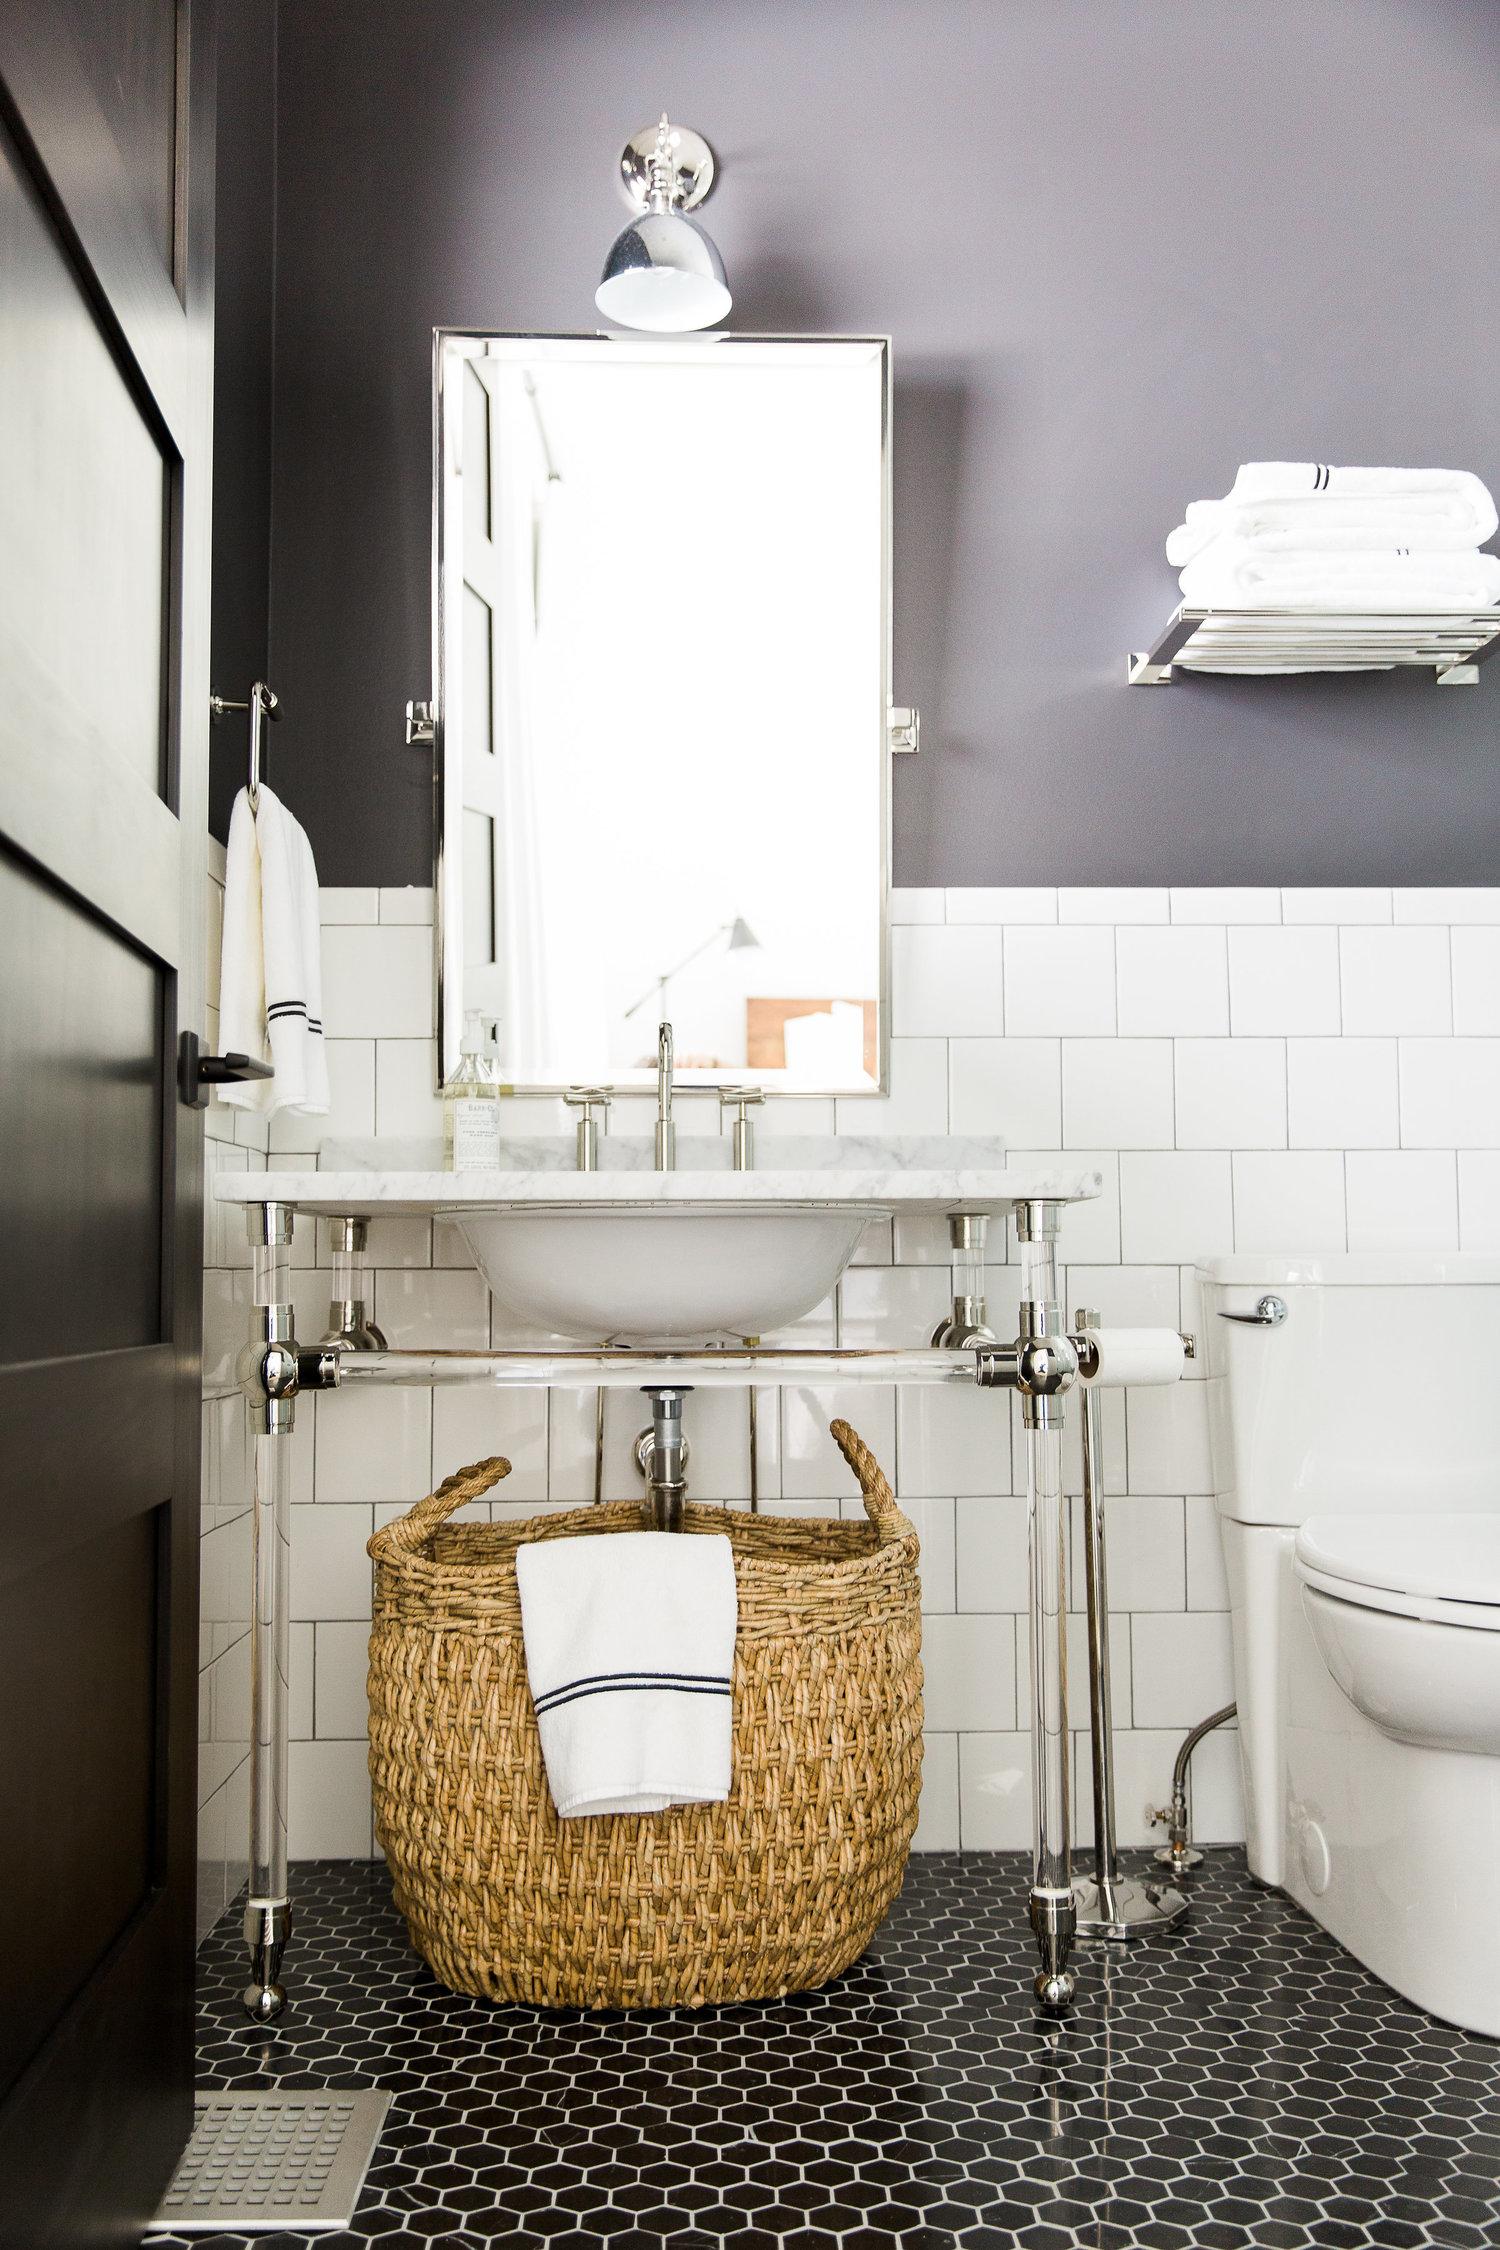 Wicker basket beneath bathroom vanity